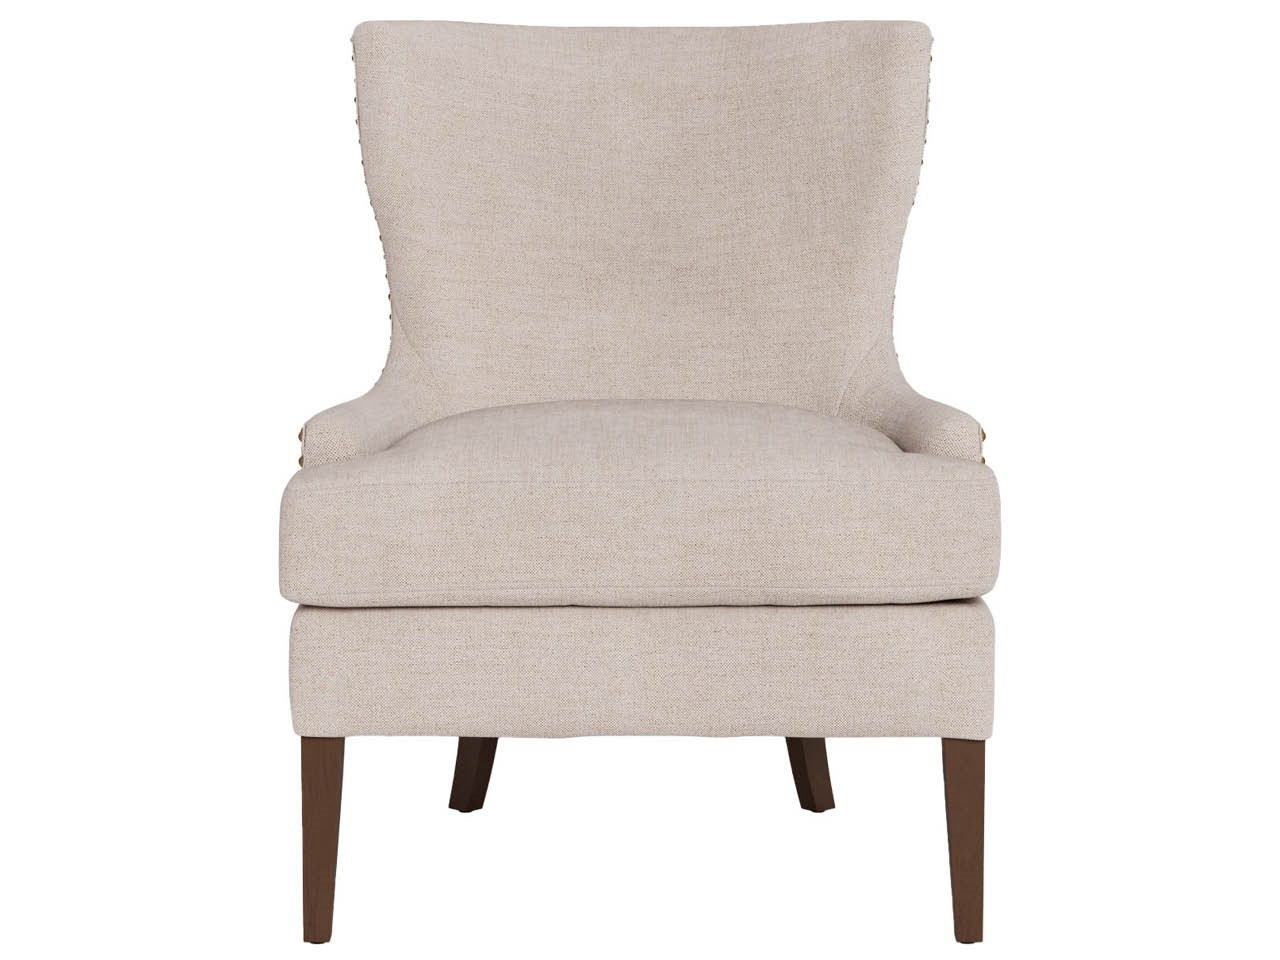 Aubrey Accent Chair - Special Order